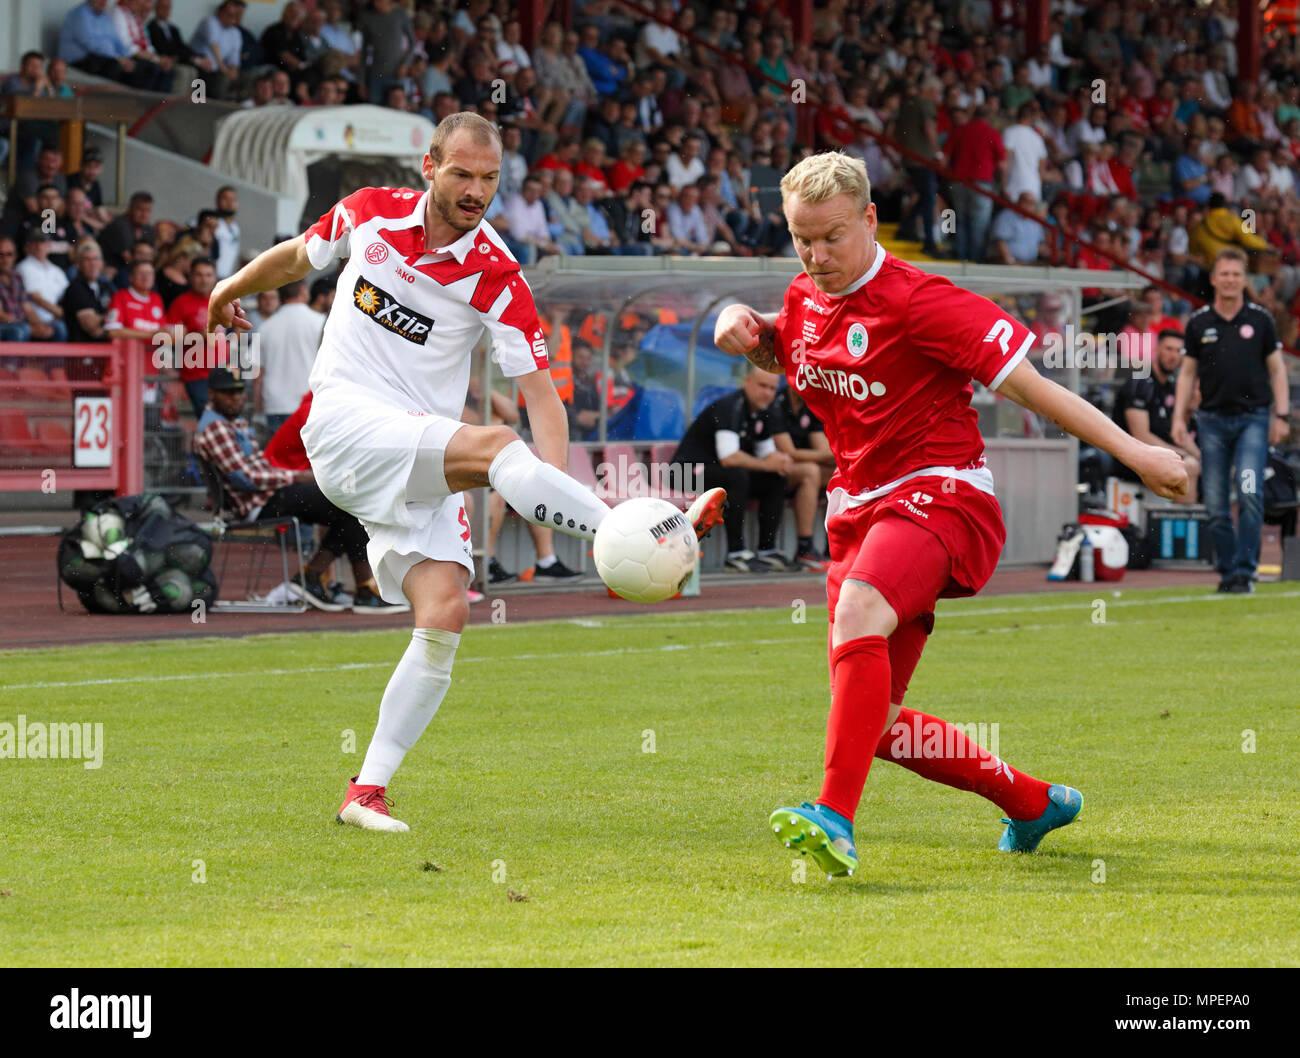 sports, football, Lower Rhine Cup, 2017/2018, final, Rot-Weiss Oberhausen vs Rot Weiss Essen 2:1, Stadium Niederrhein Oberhausen, scene of the match, Robin Urban (RWE) left and Tim Hermes (RWO) - Stock Image